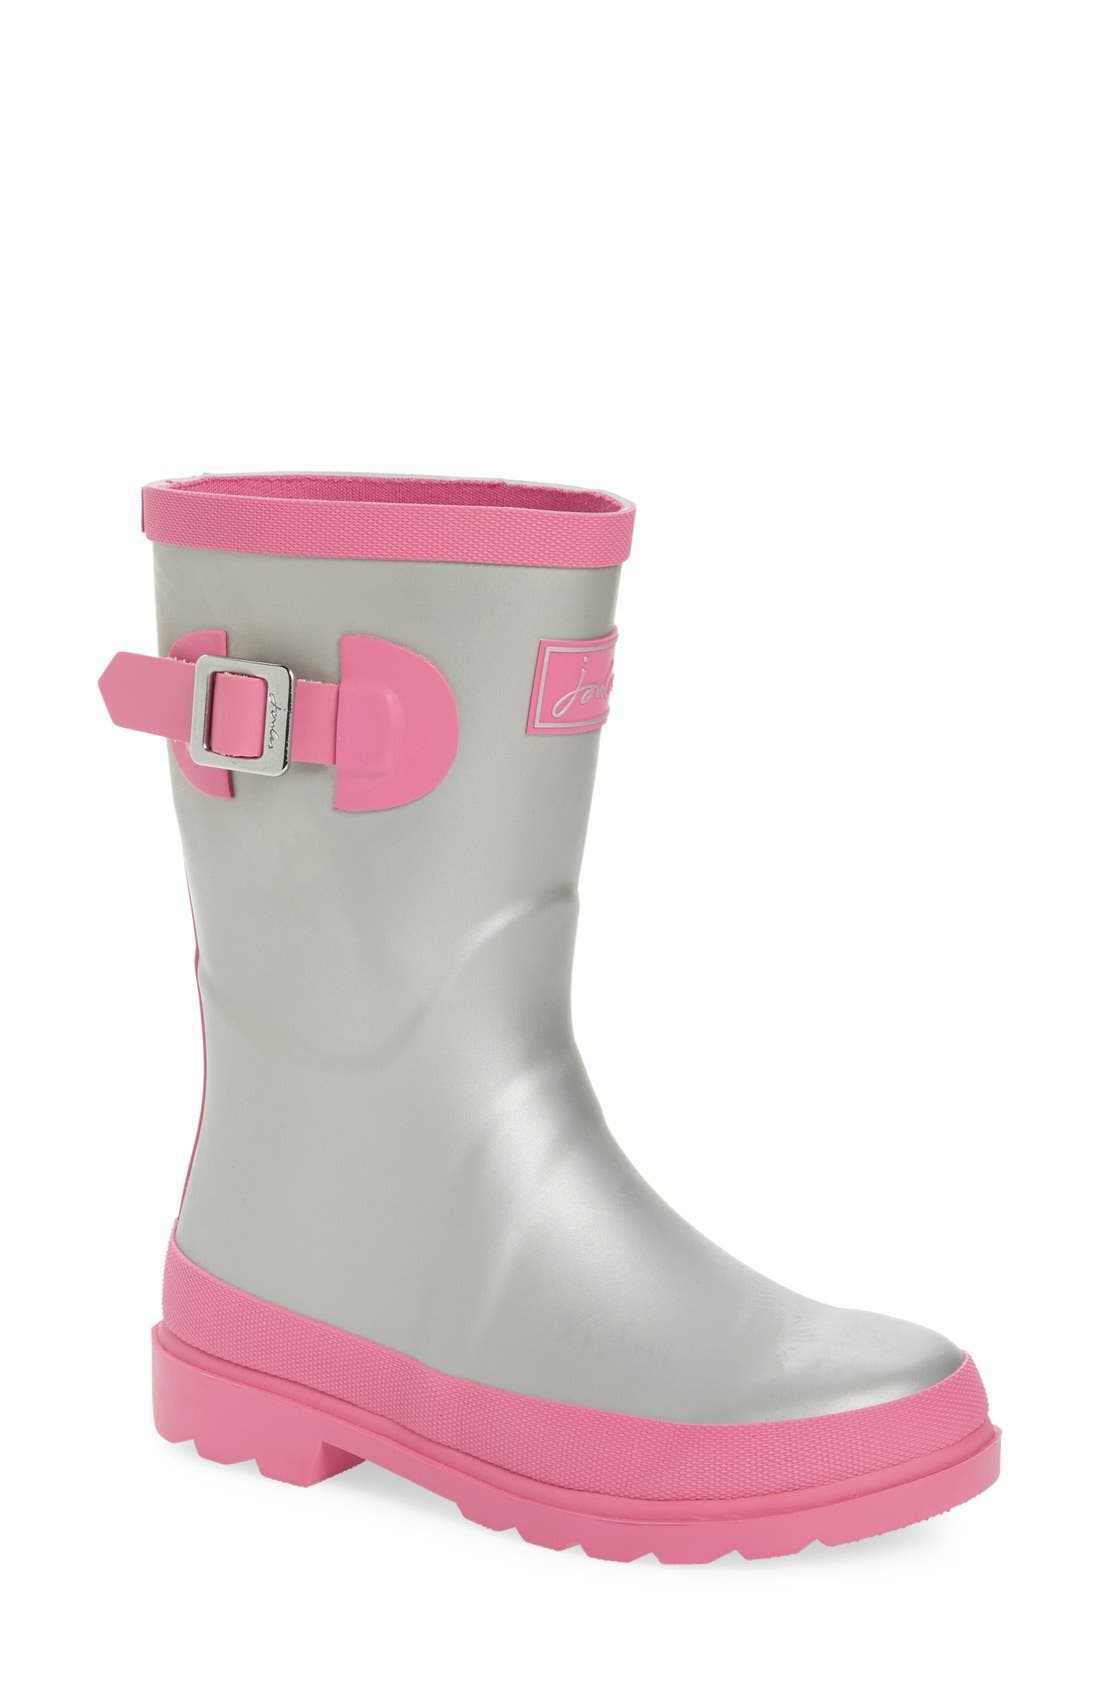 Joules Field Welly Rain Boot (Walker, Toddler, Little Kid & Big Kid)